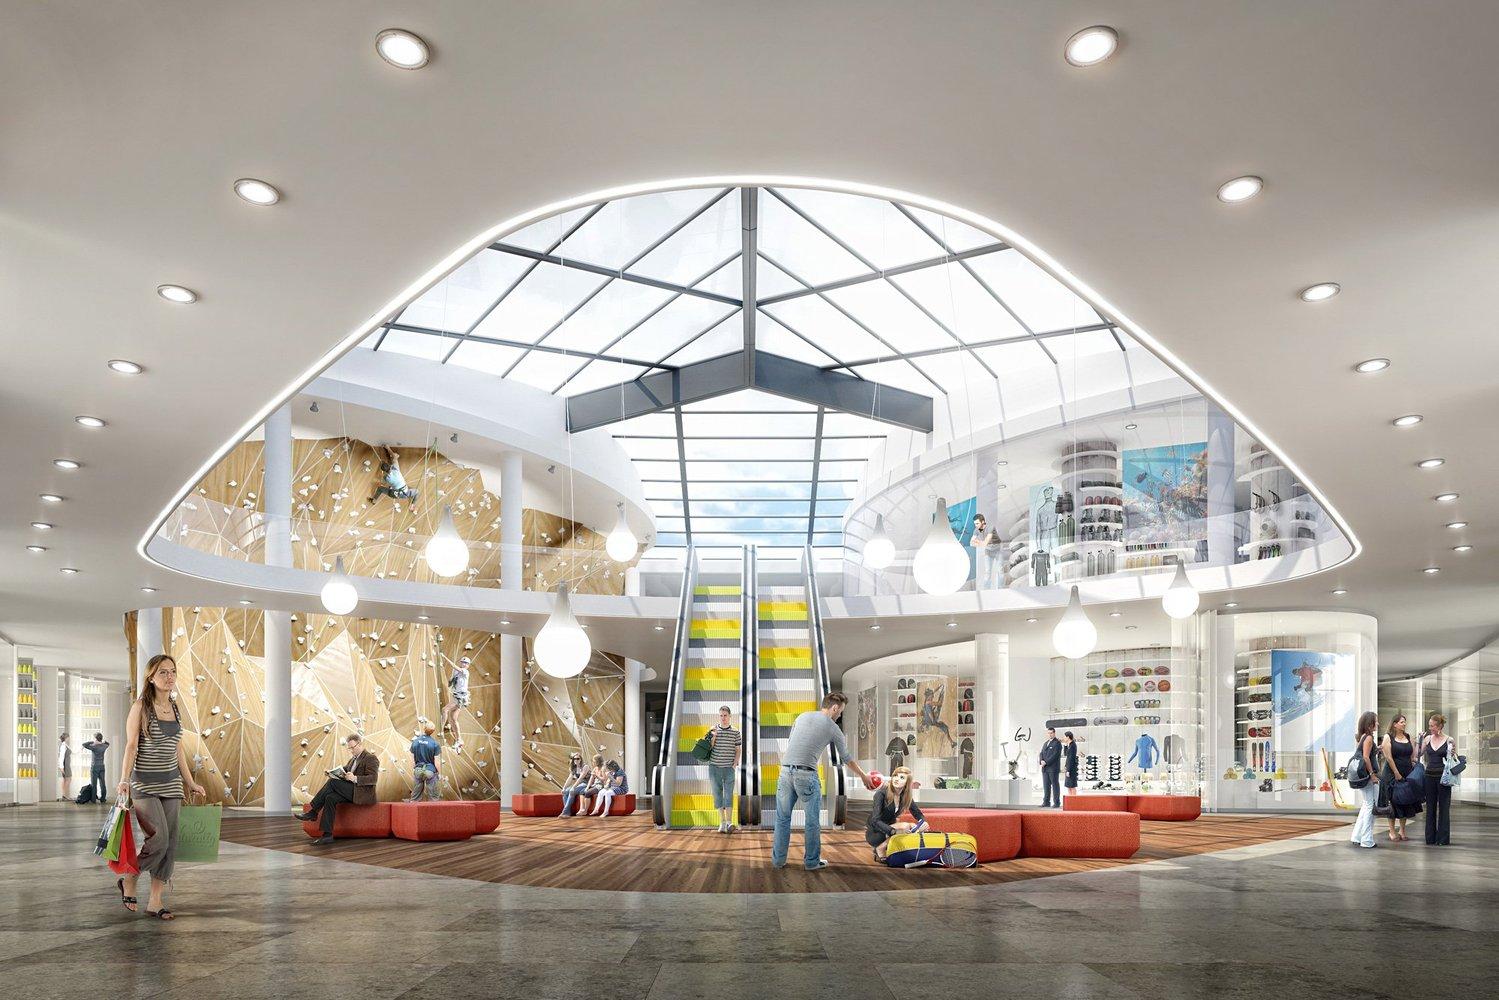 Silocenter sports and leisure center neostudio architekci bpt jedlinski